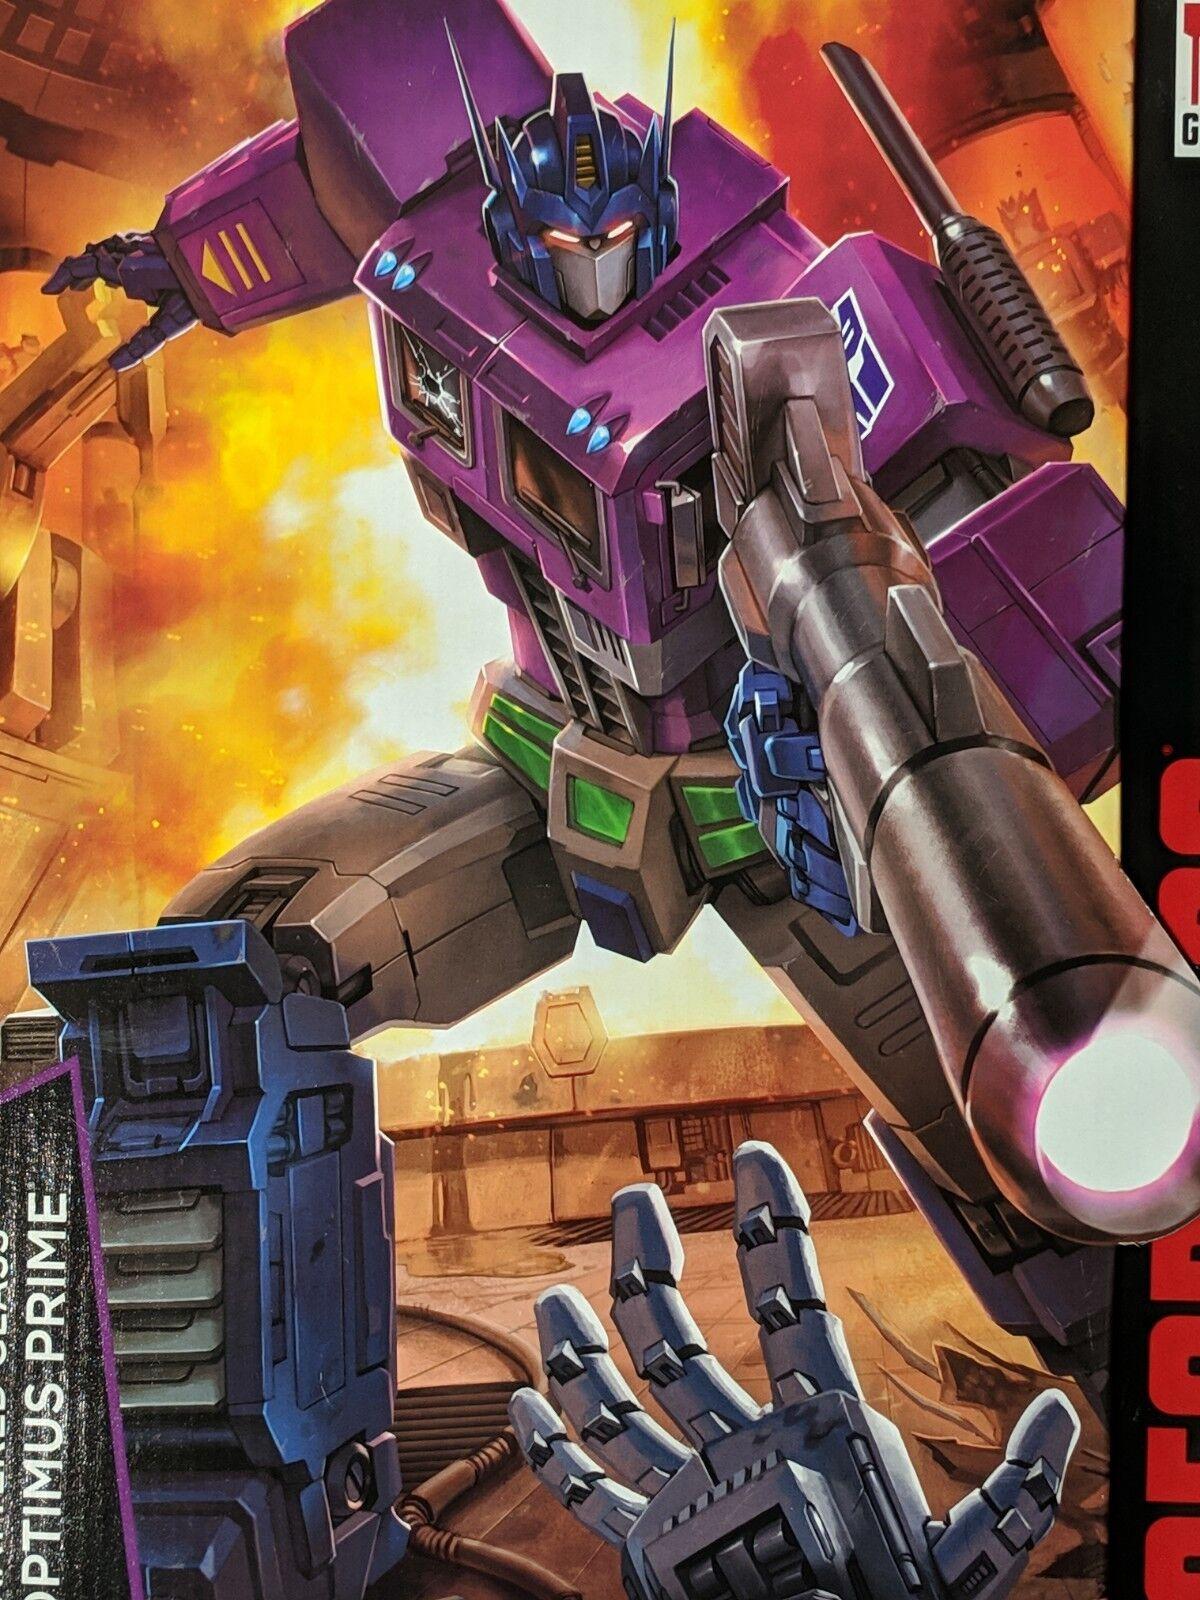 Transformers Masterpiece de vidrio destrozado Hasbro Optimus Prime